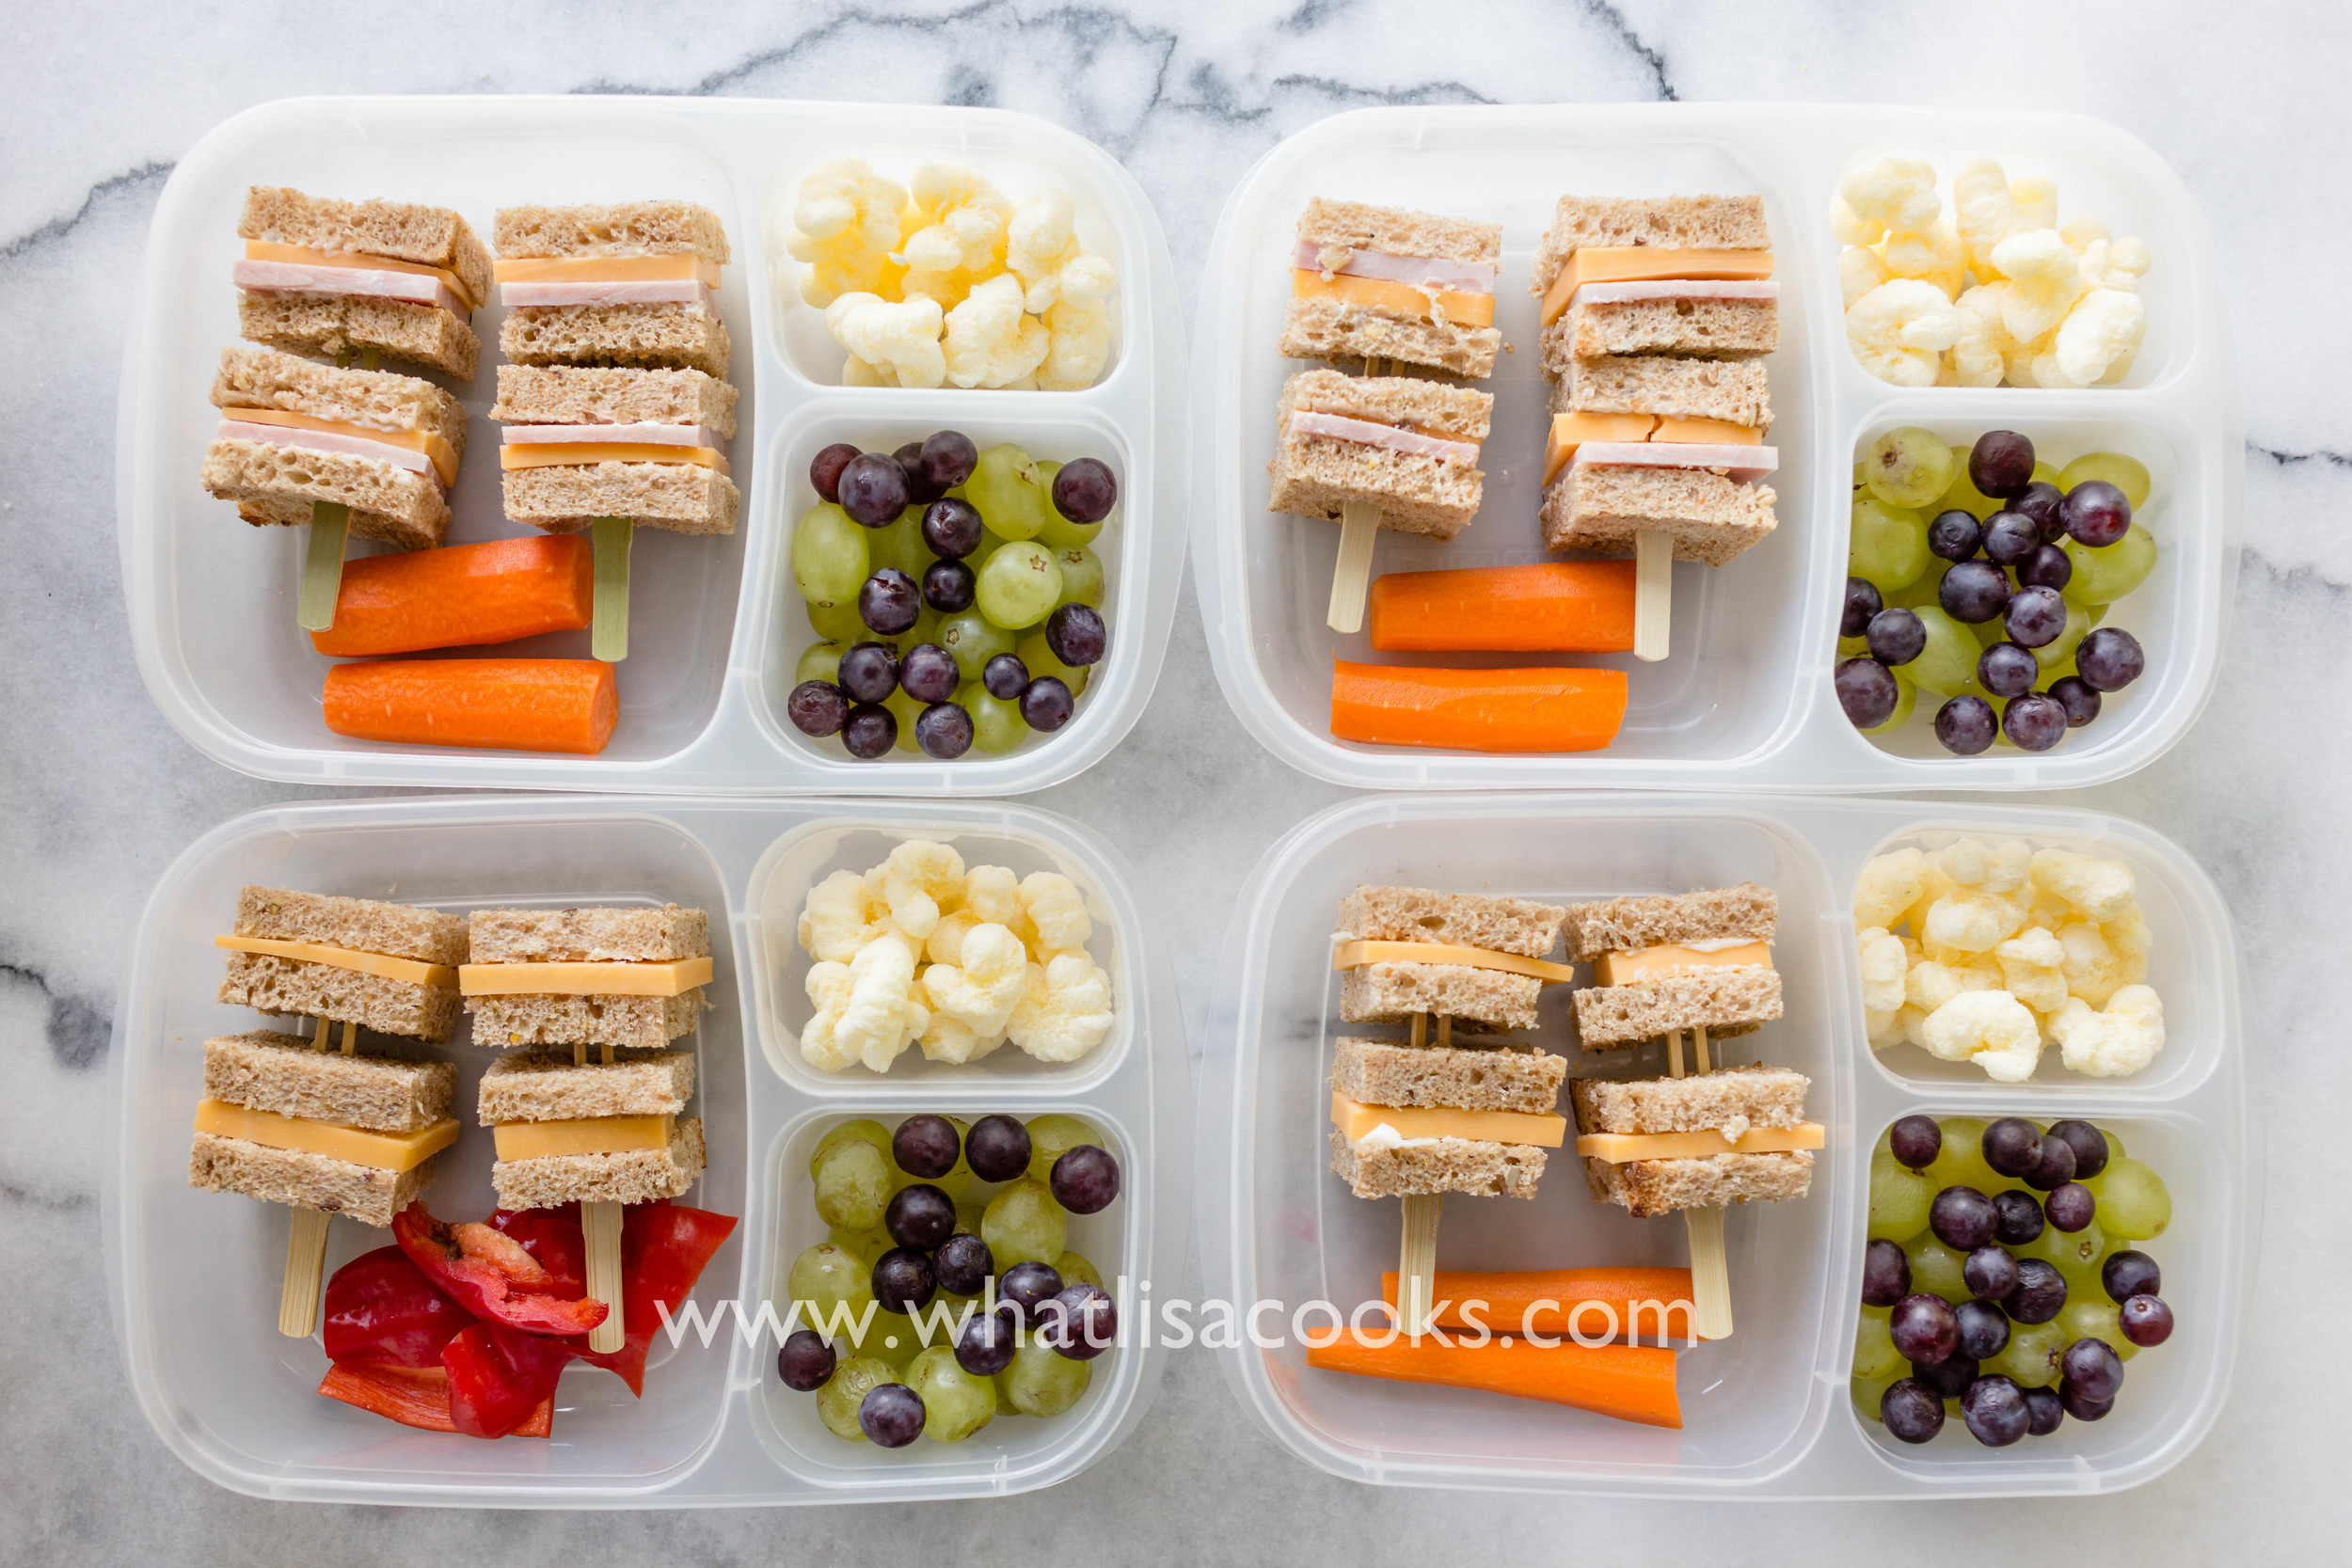 school-lunch-October 05, 2015-2.jpg